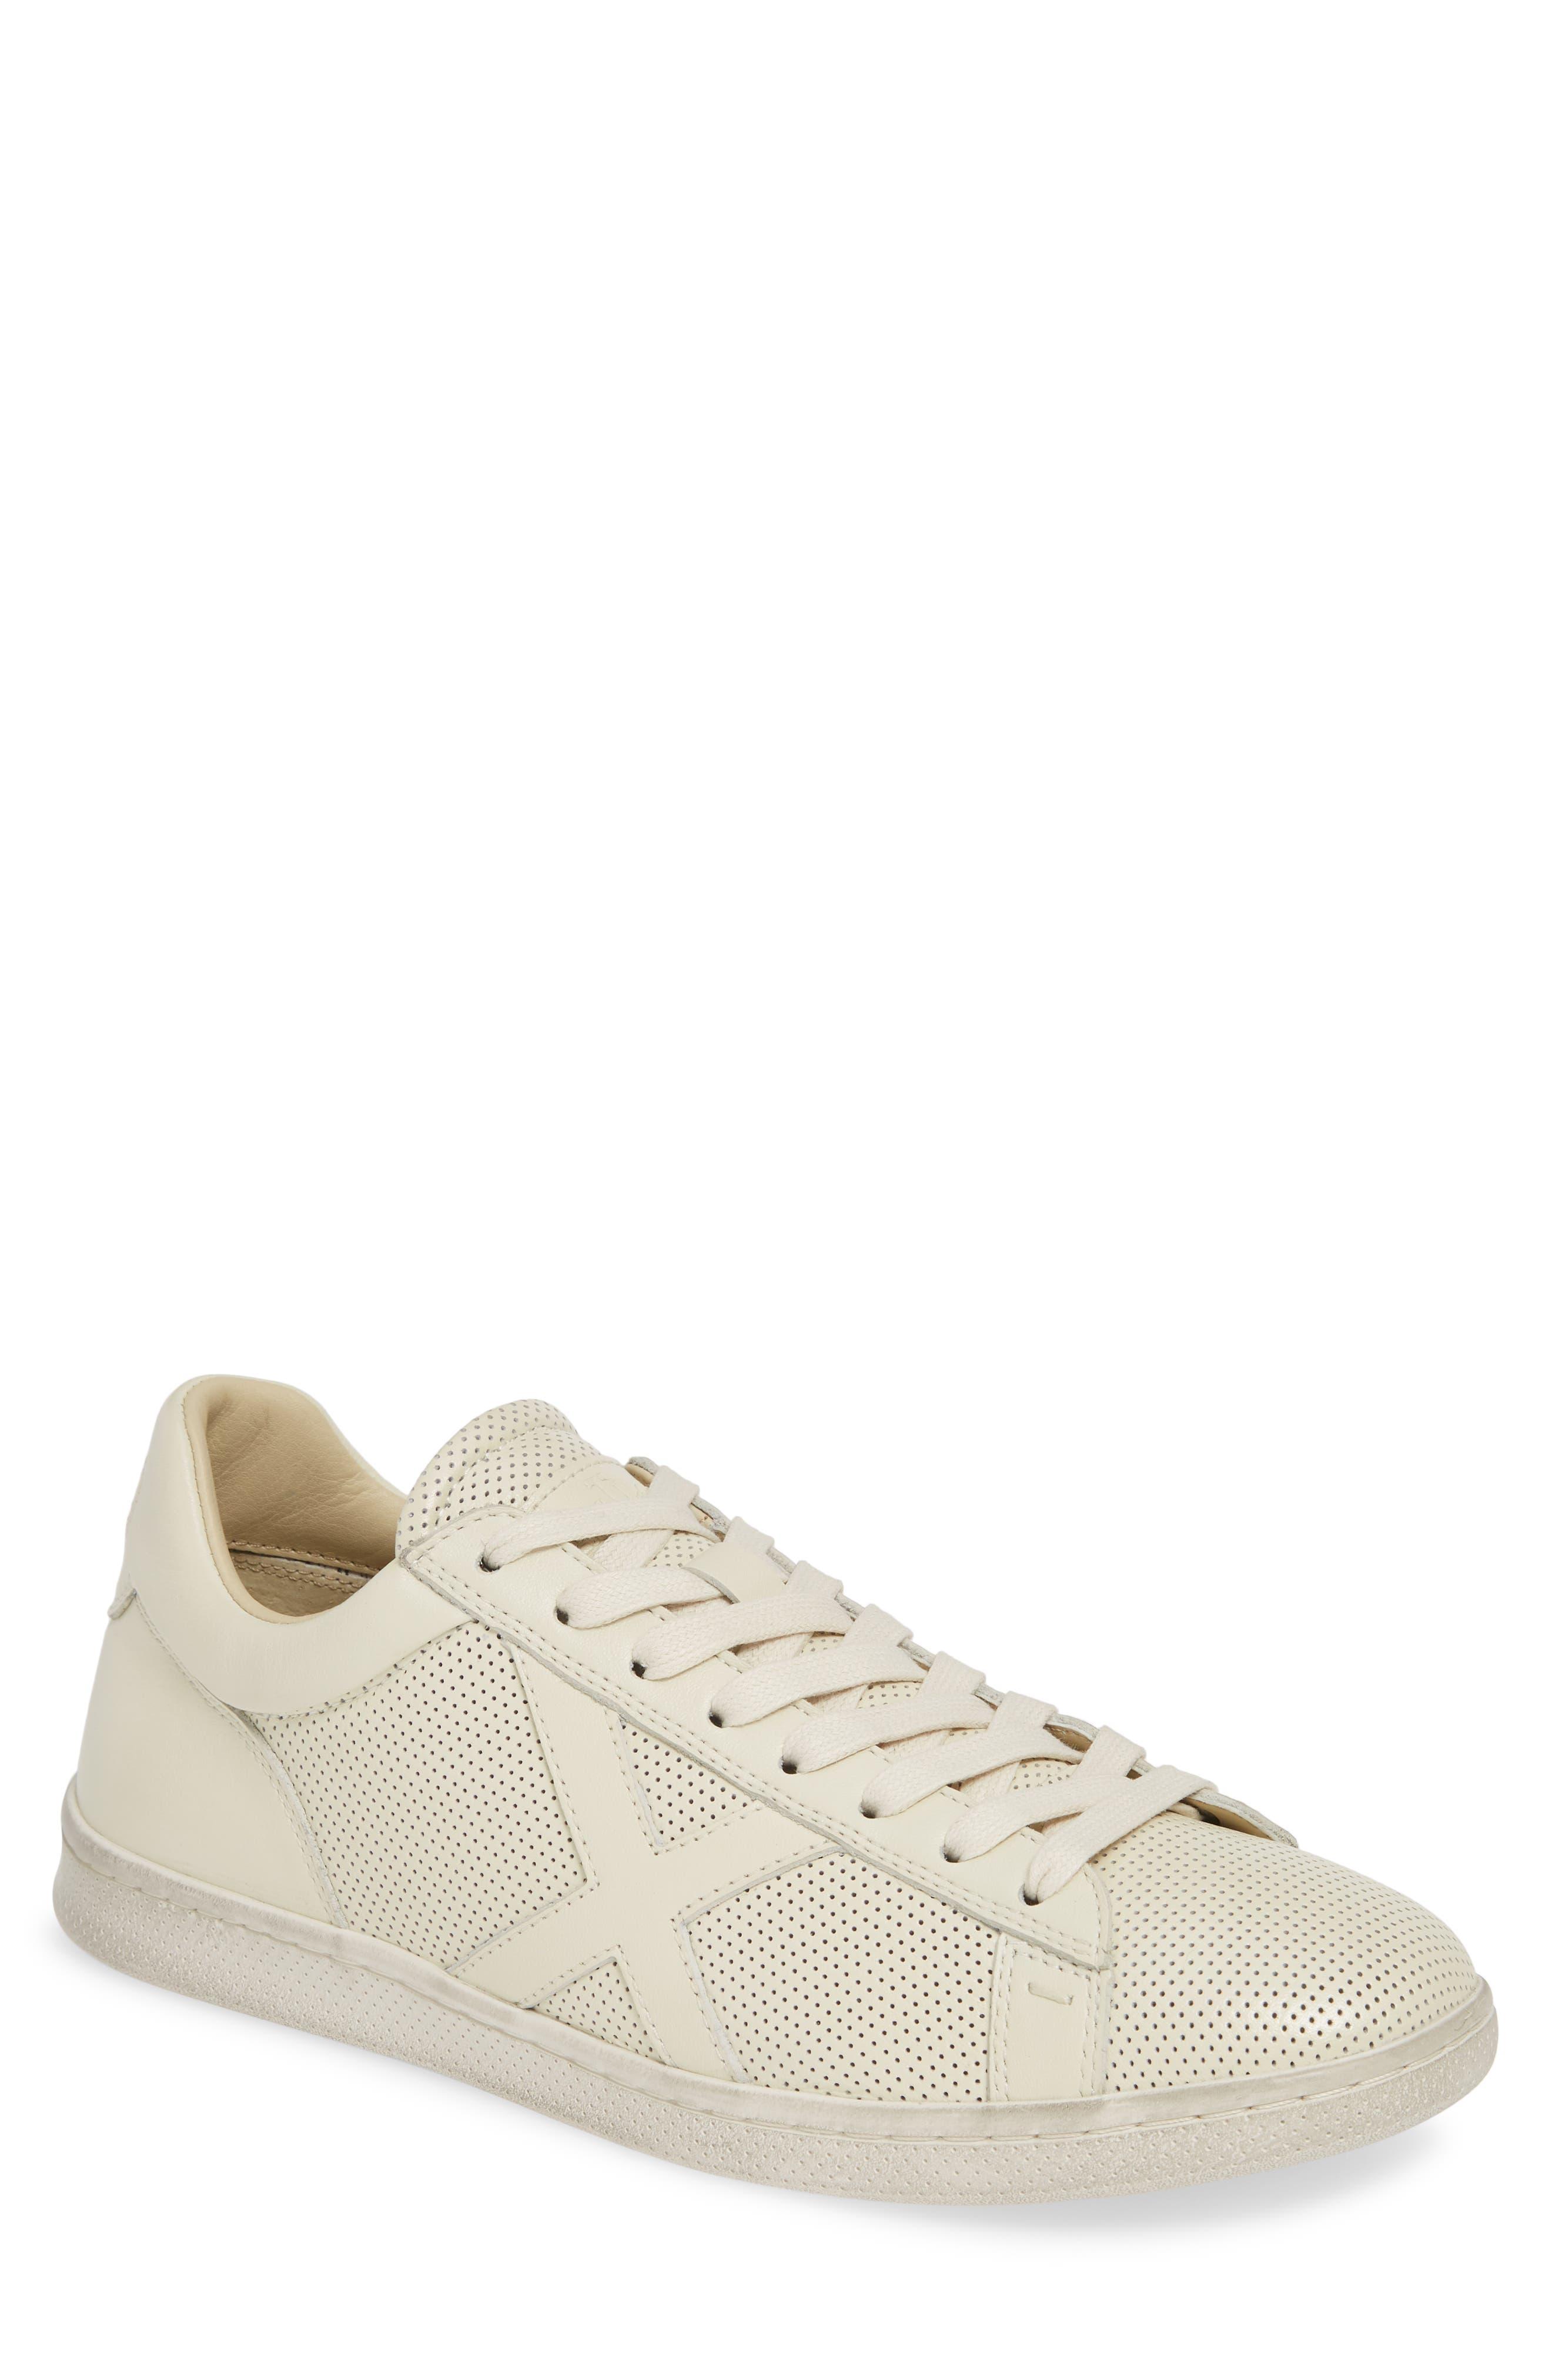 Bootleg By John Varvatos Perforated Sneaker- White